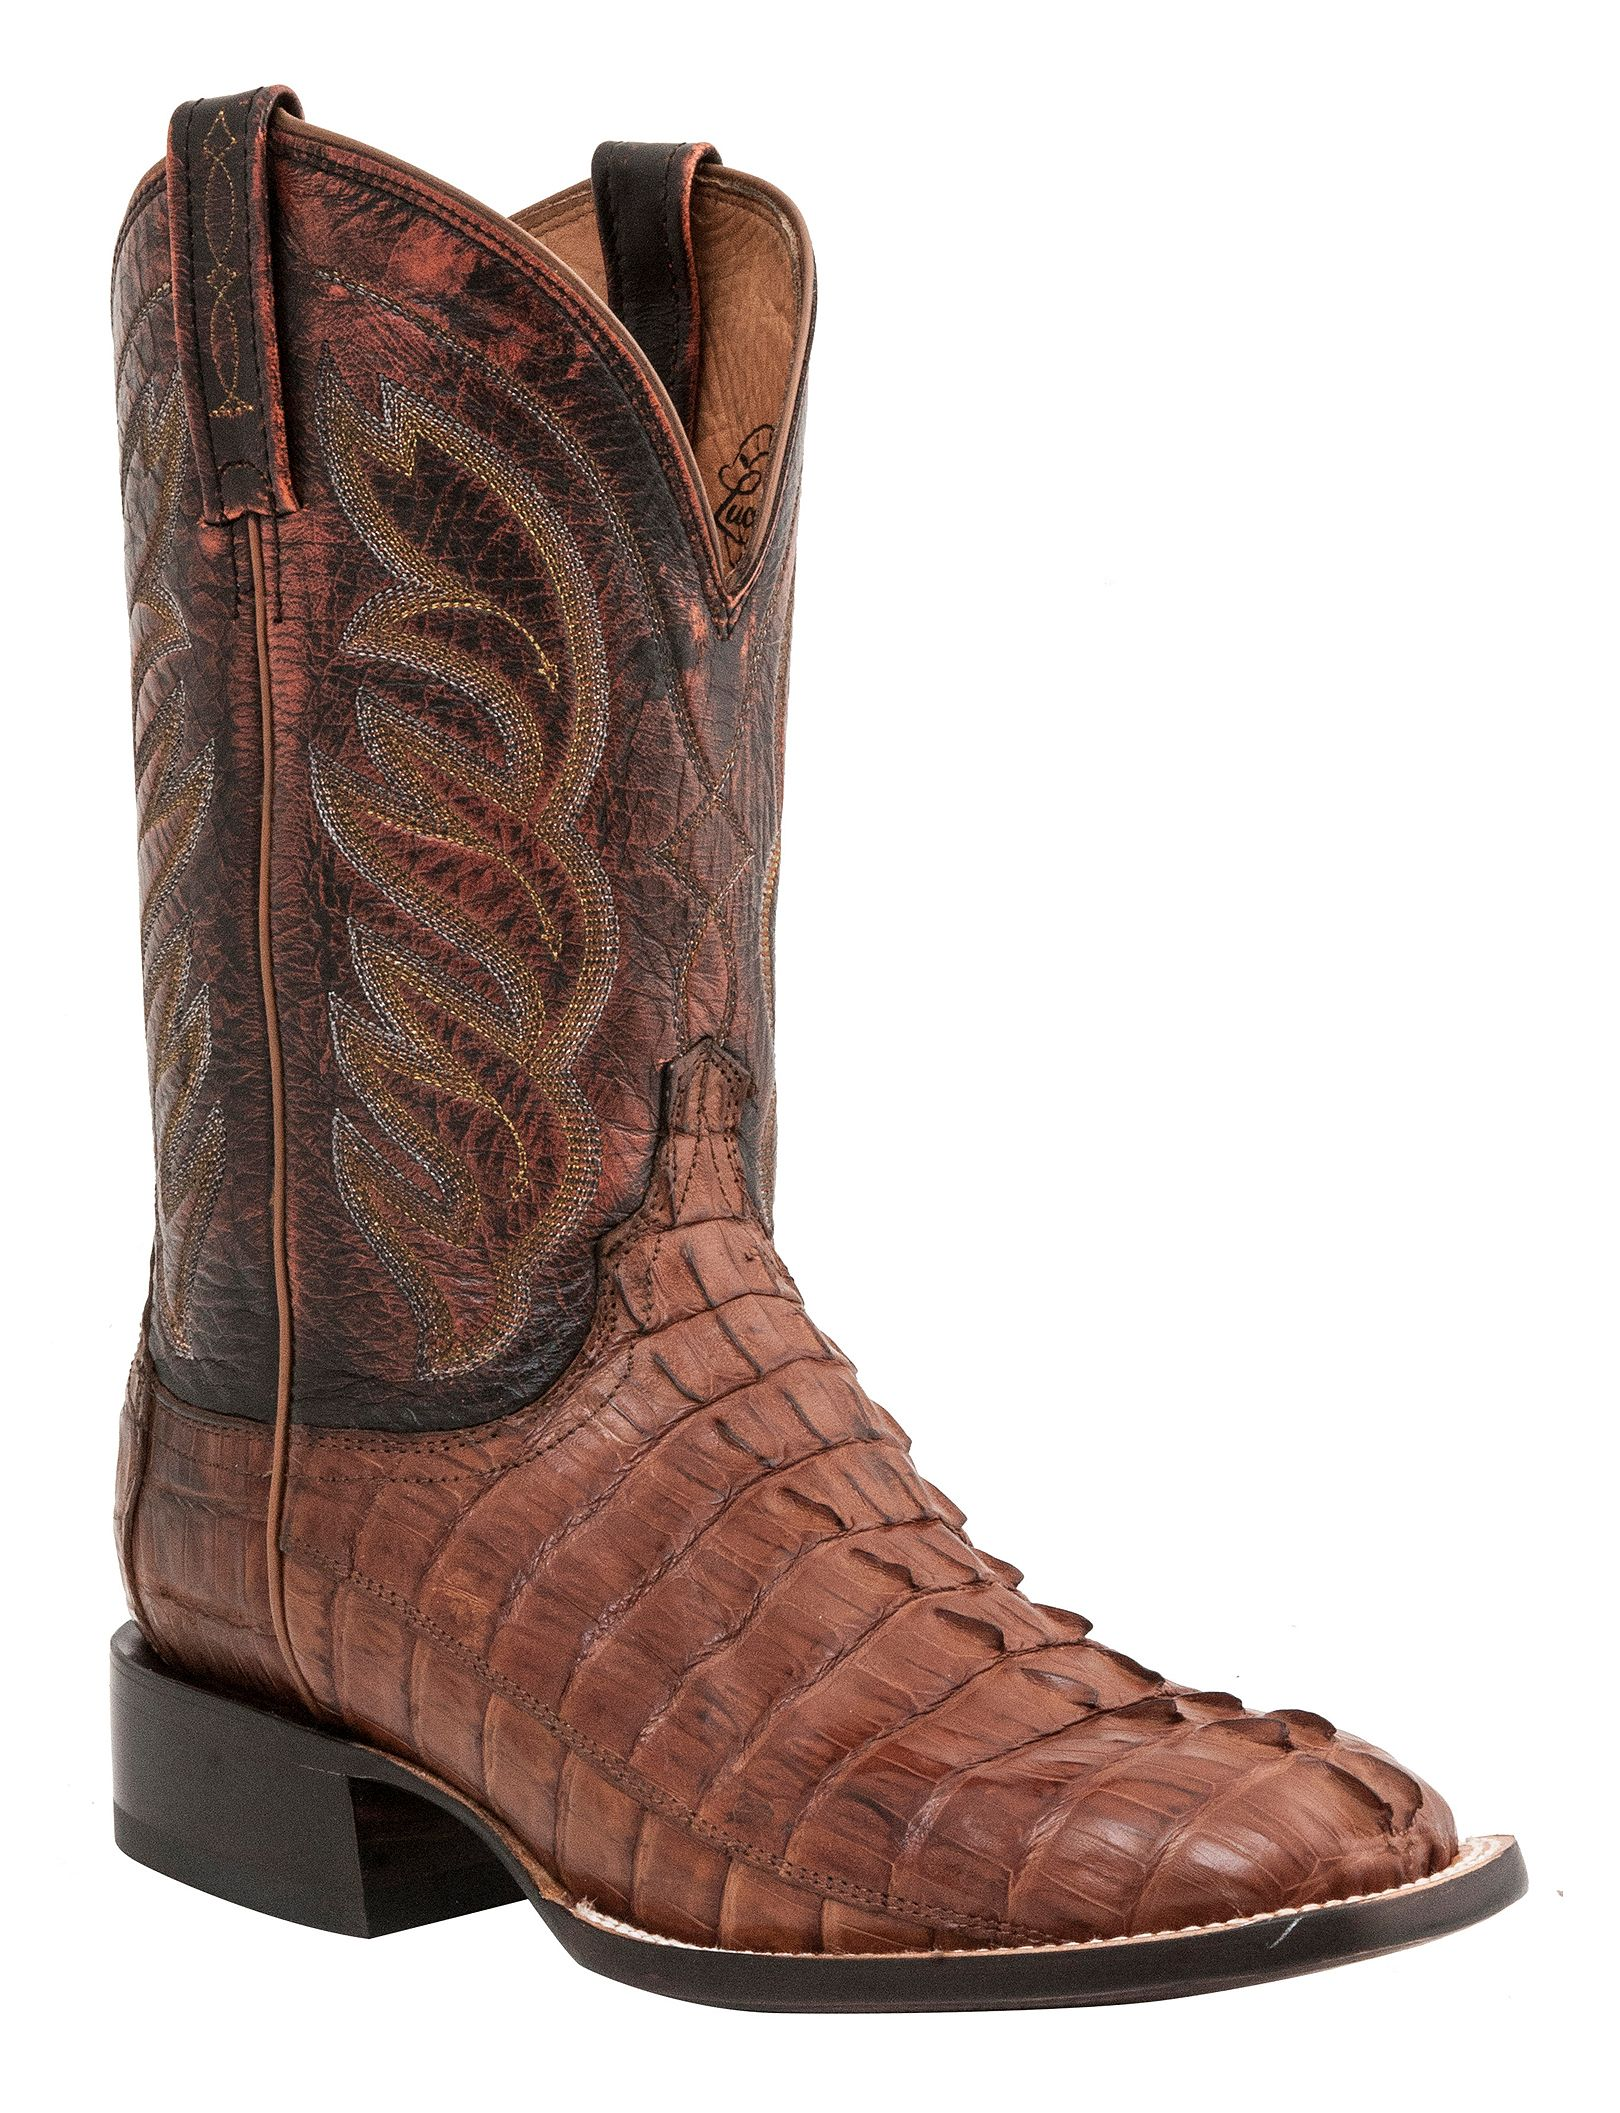 Lucchese 1883 Handmade Landon Hornback Caiman Tail Cowboy